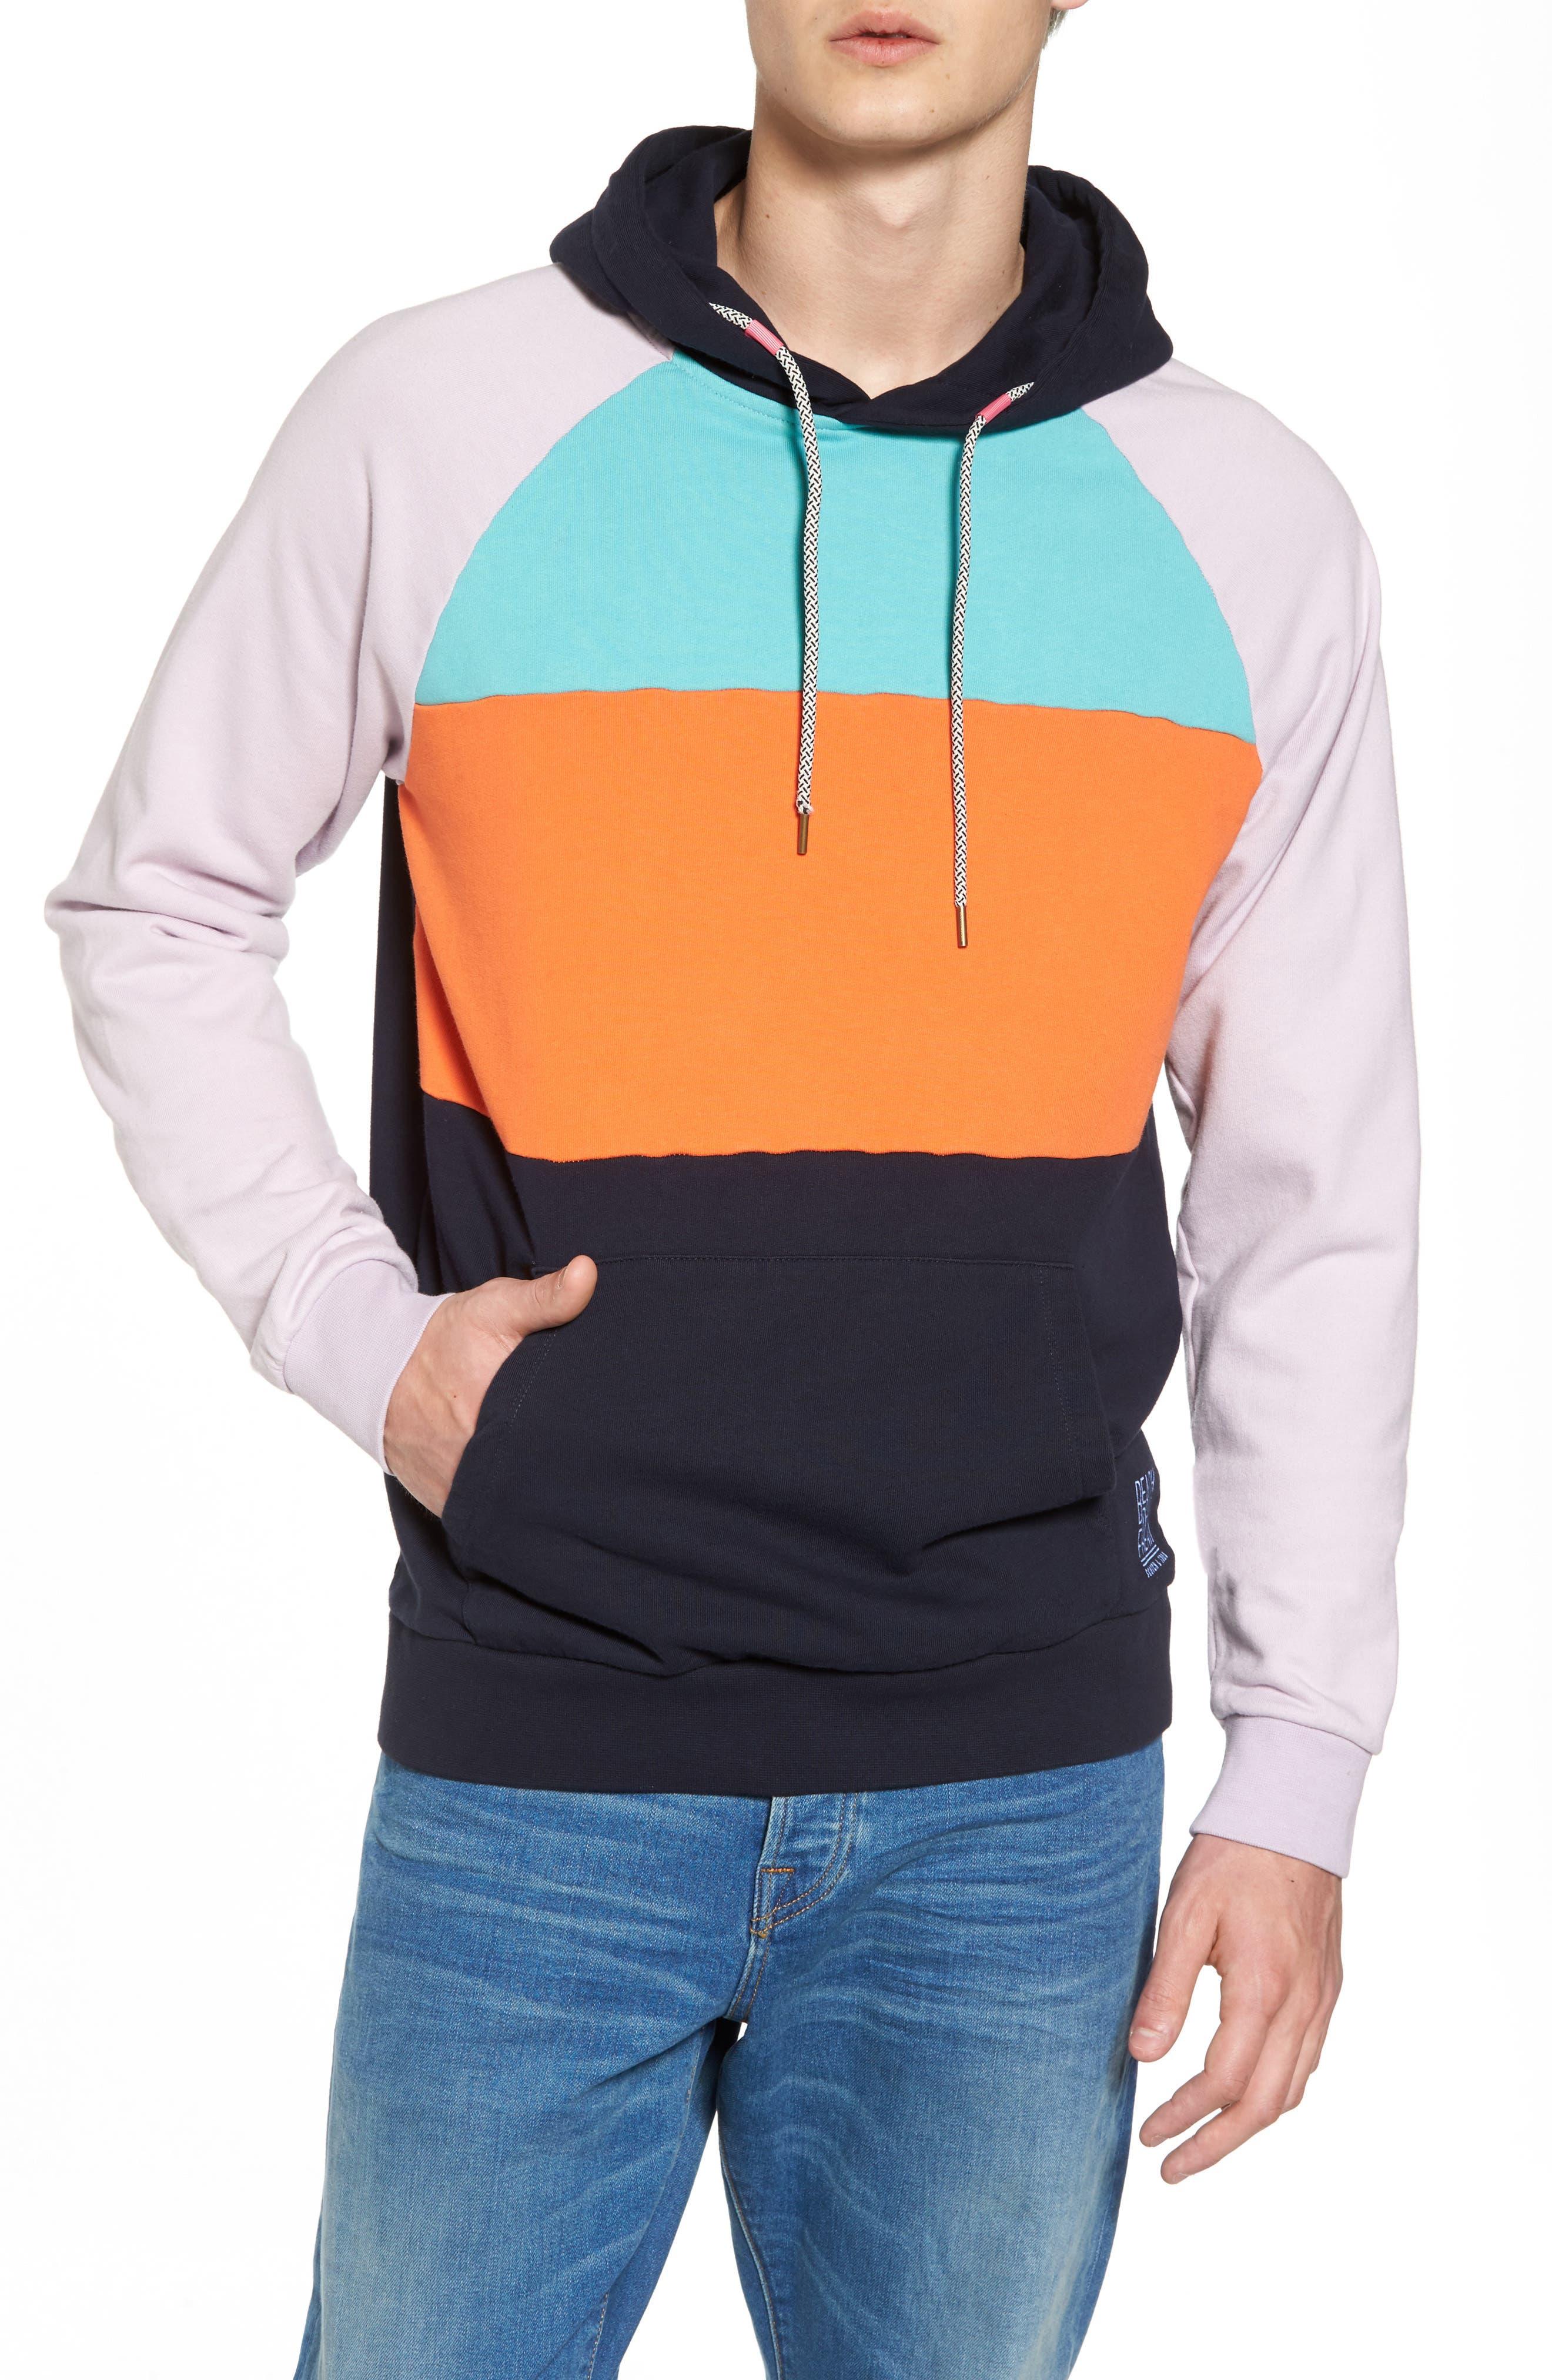 Summer Colorblock Hoodie Sweatshirt,                             Main thumbnail 1, color,                             100